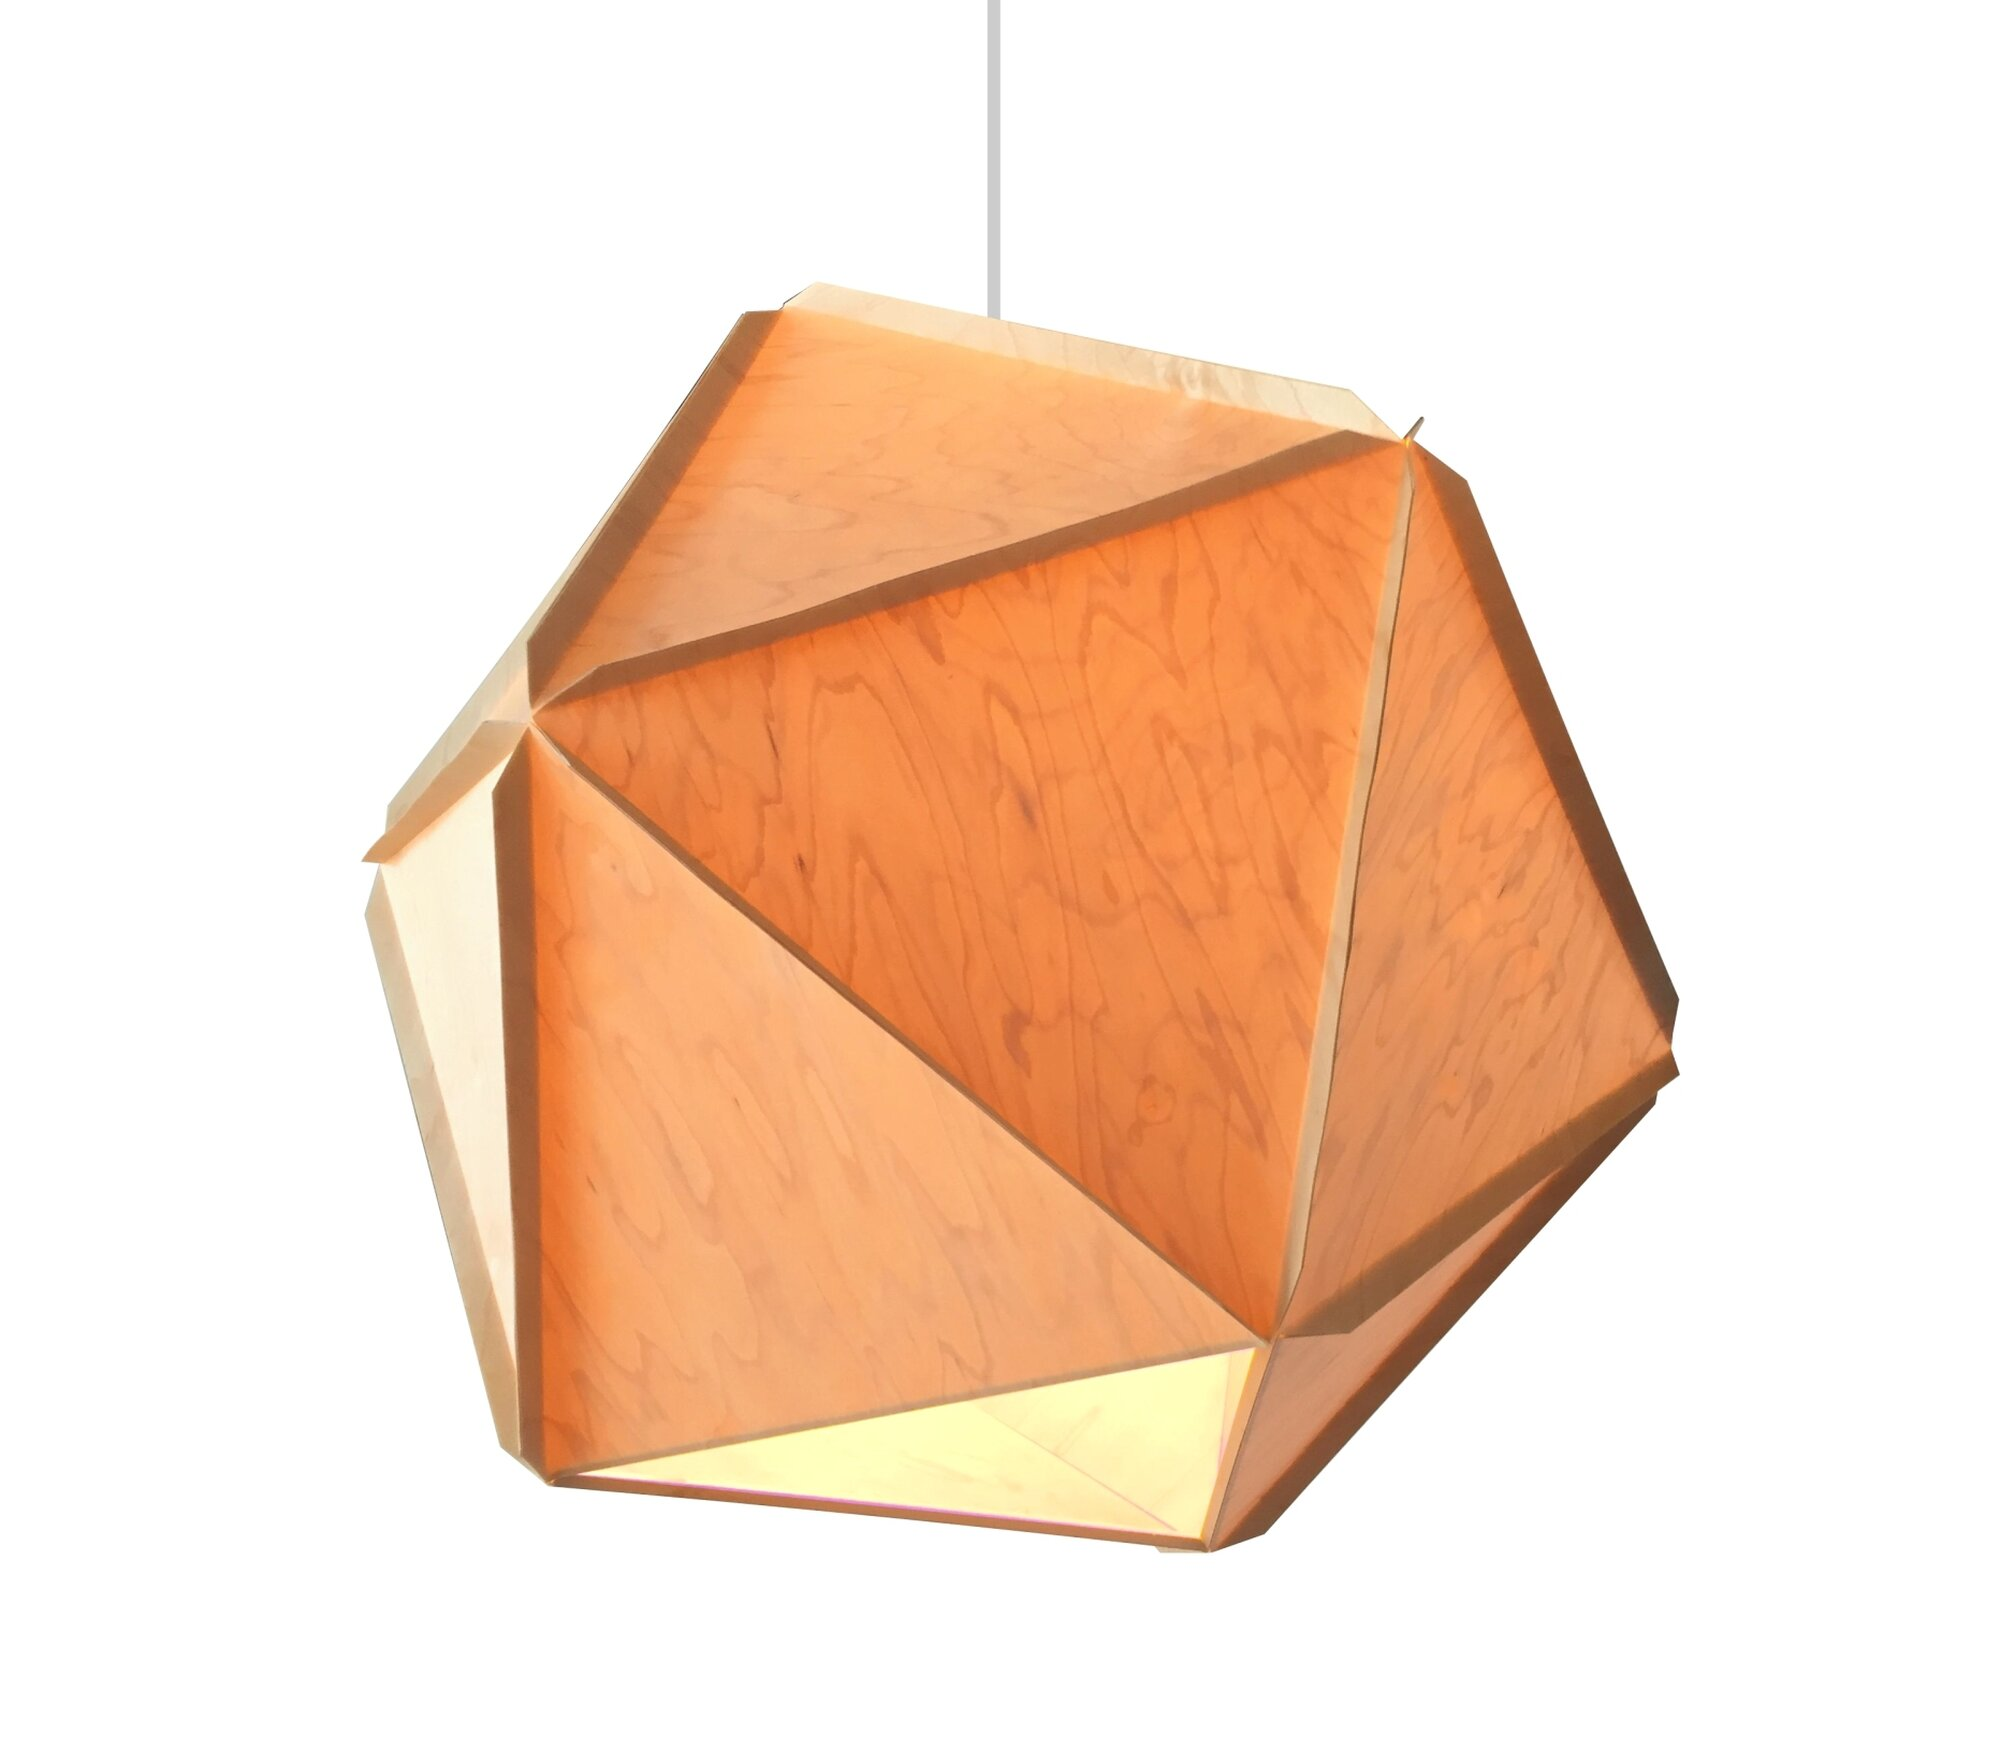 Woodhedron